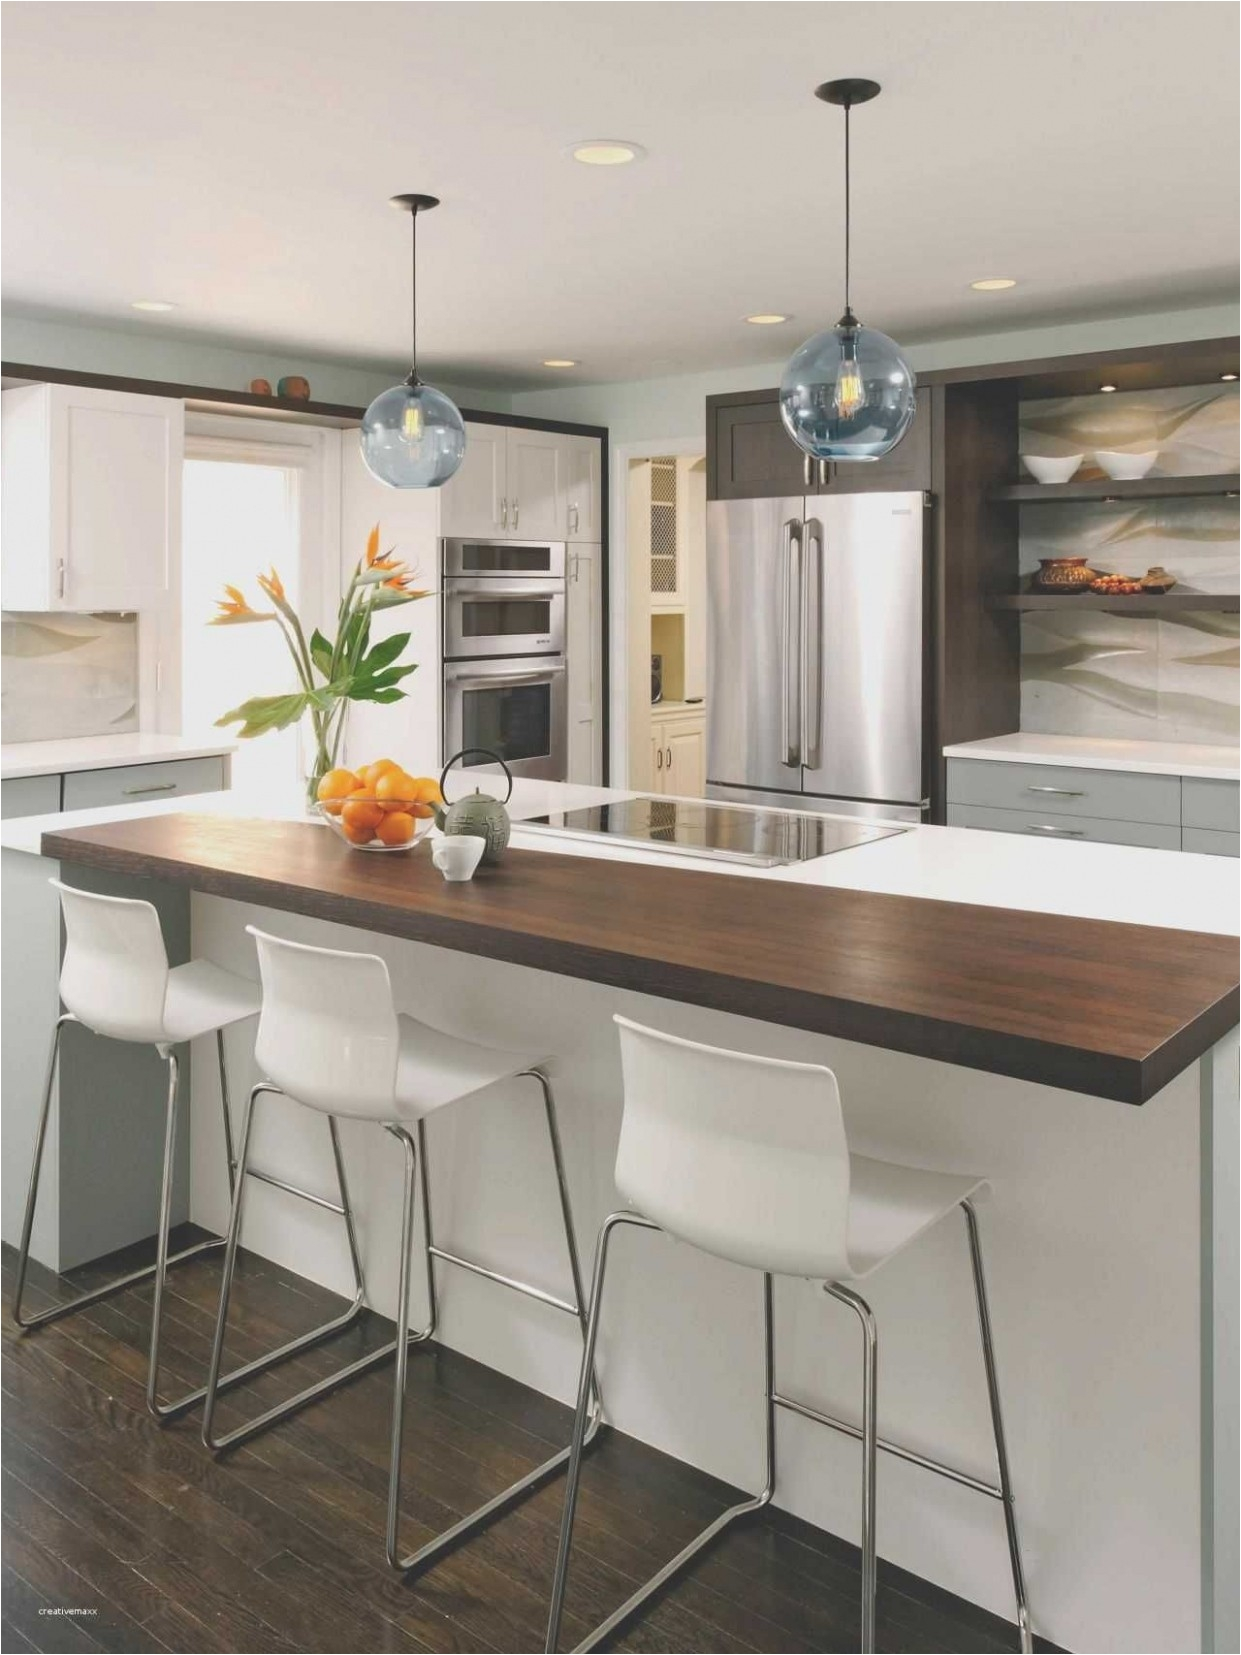 Modern Kitchen Living Room Ideas Inspirationa Modern Living Room And Kitchen Design Fresh Shaker Chairs 0d Design